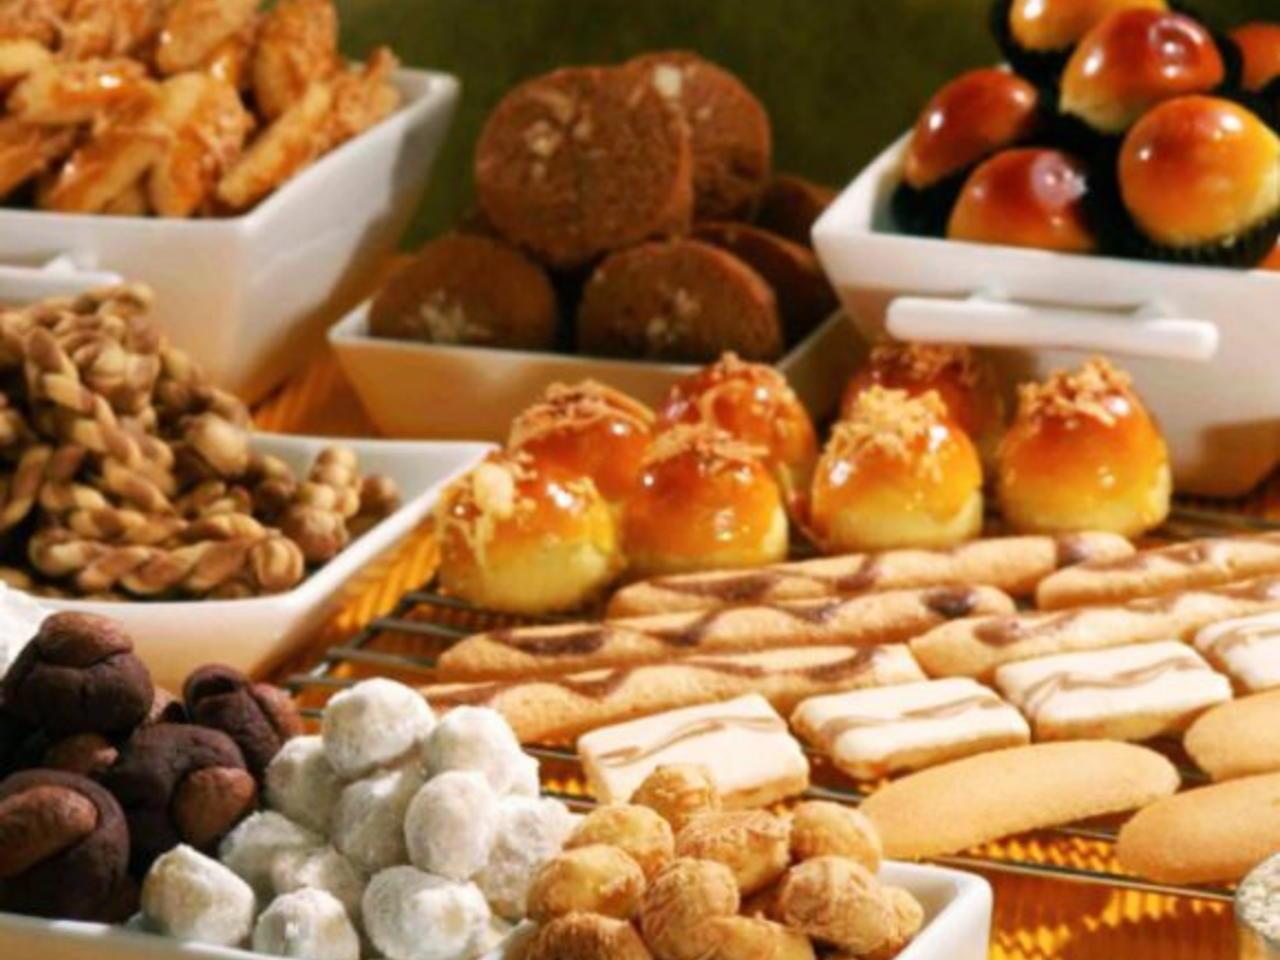 Resep Kue Bangkit Jtt: 0851-0126-4426 Camilan Nusantara, Distributor Snack Curah